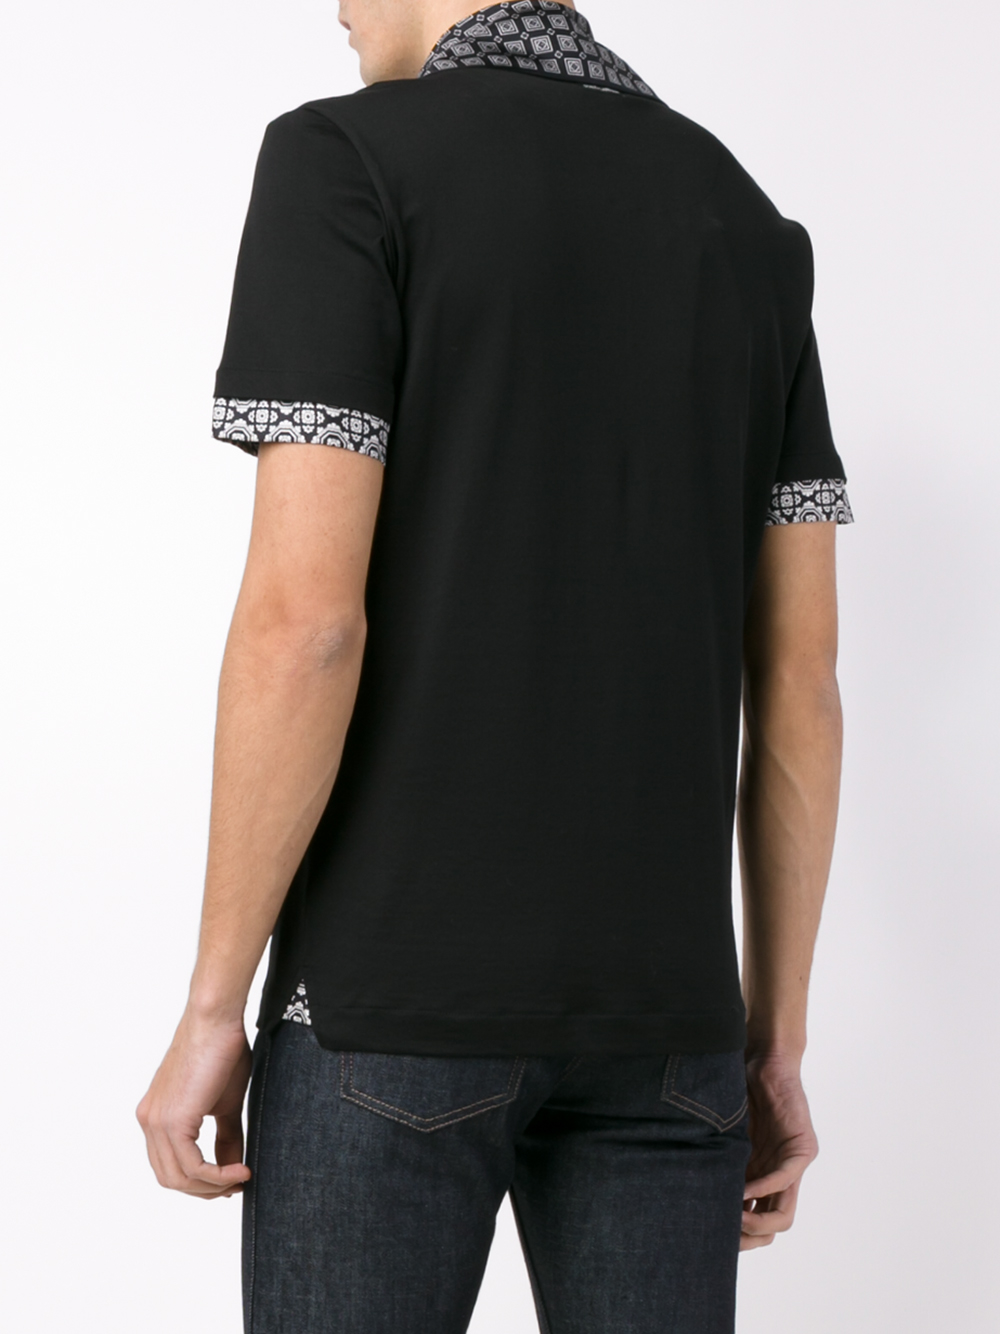 Dolce Gabbana Scarf Detail T Shirt In Black For Men Lyst